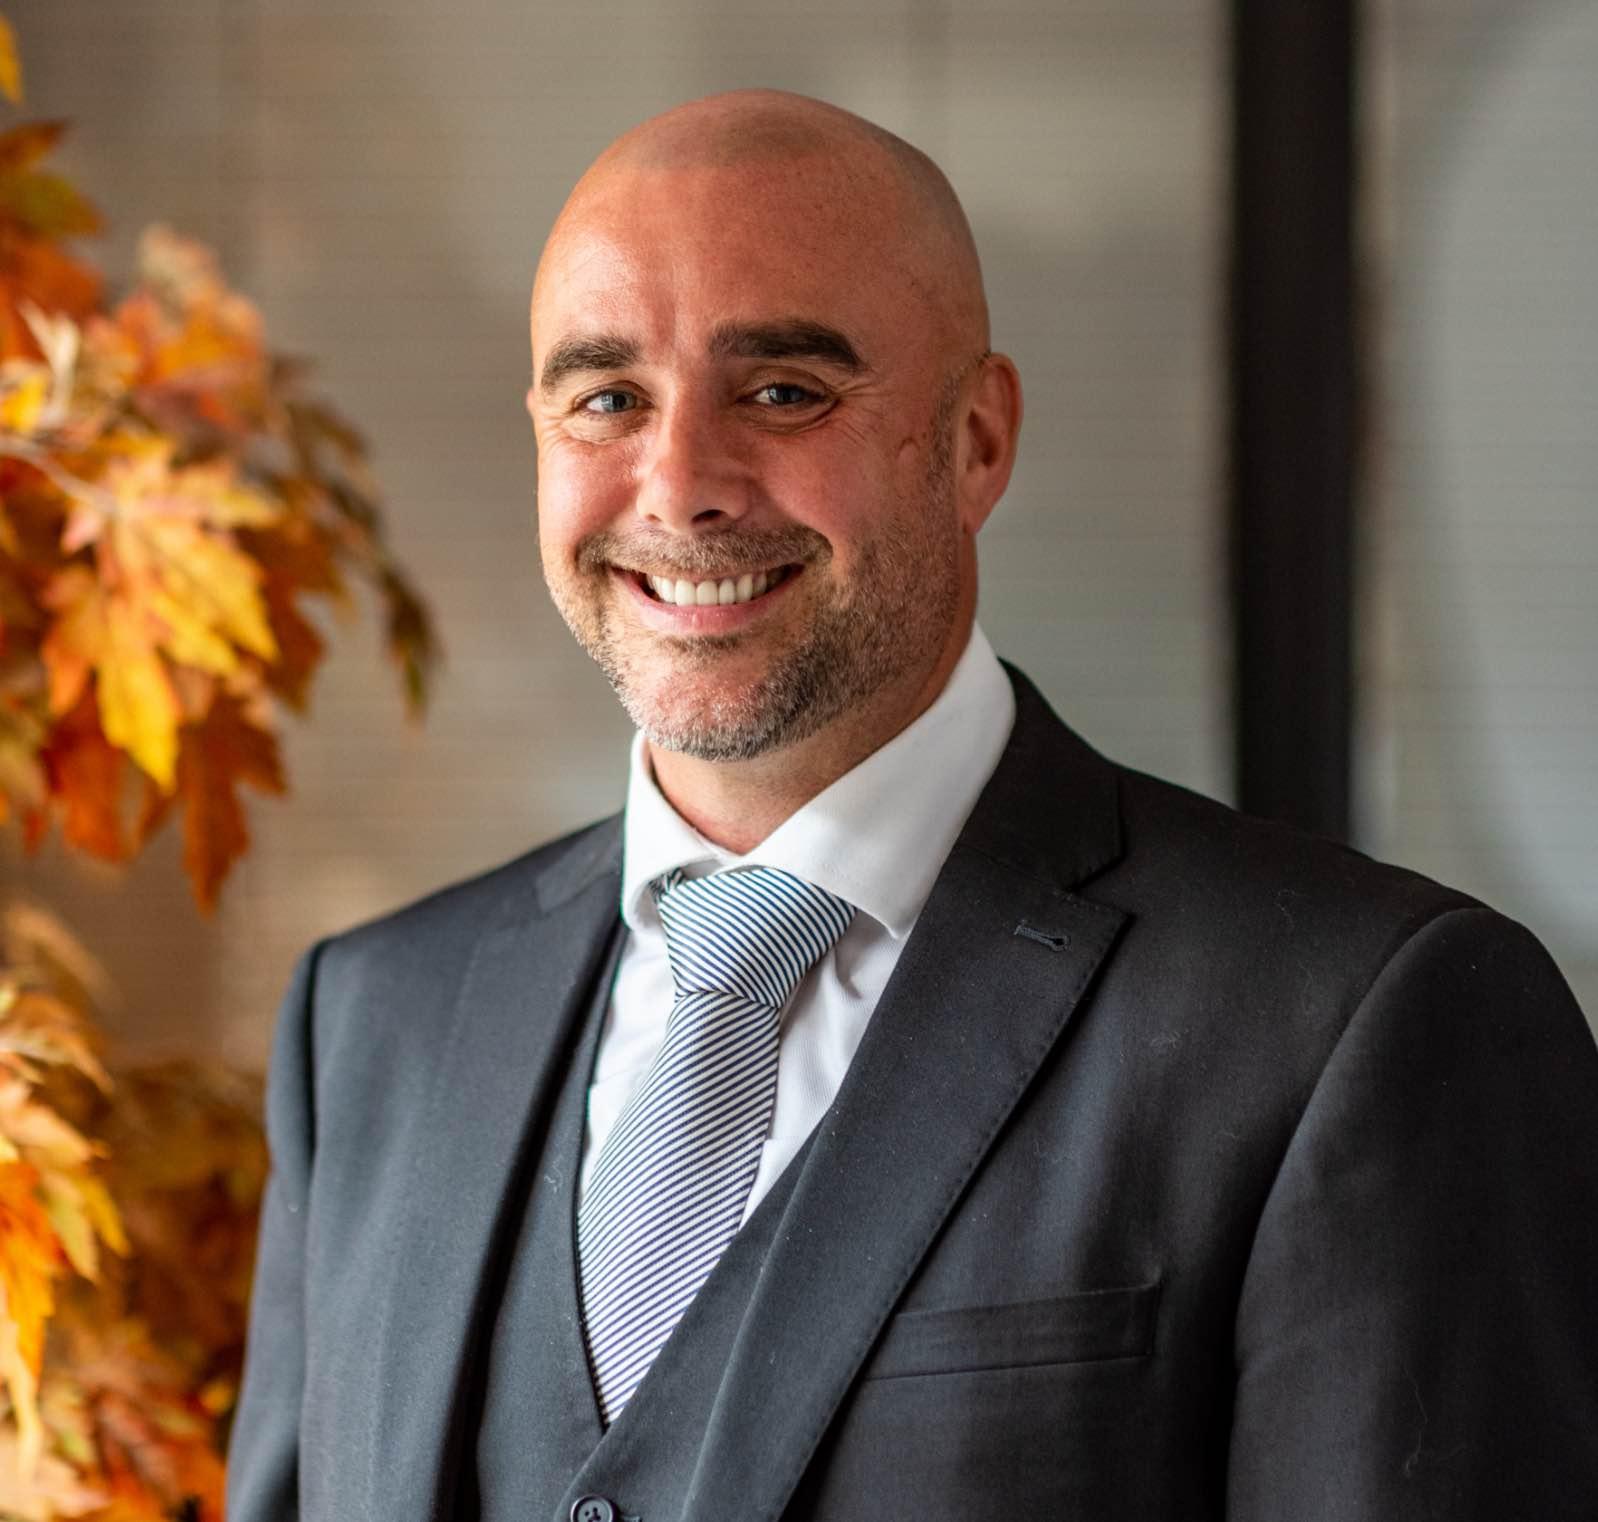 Chris Linnitt personal injury law expert